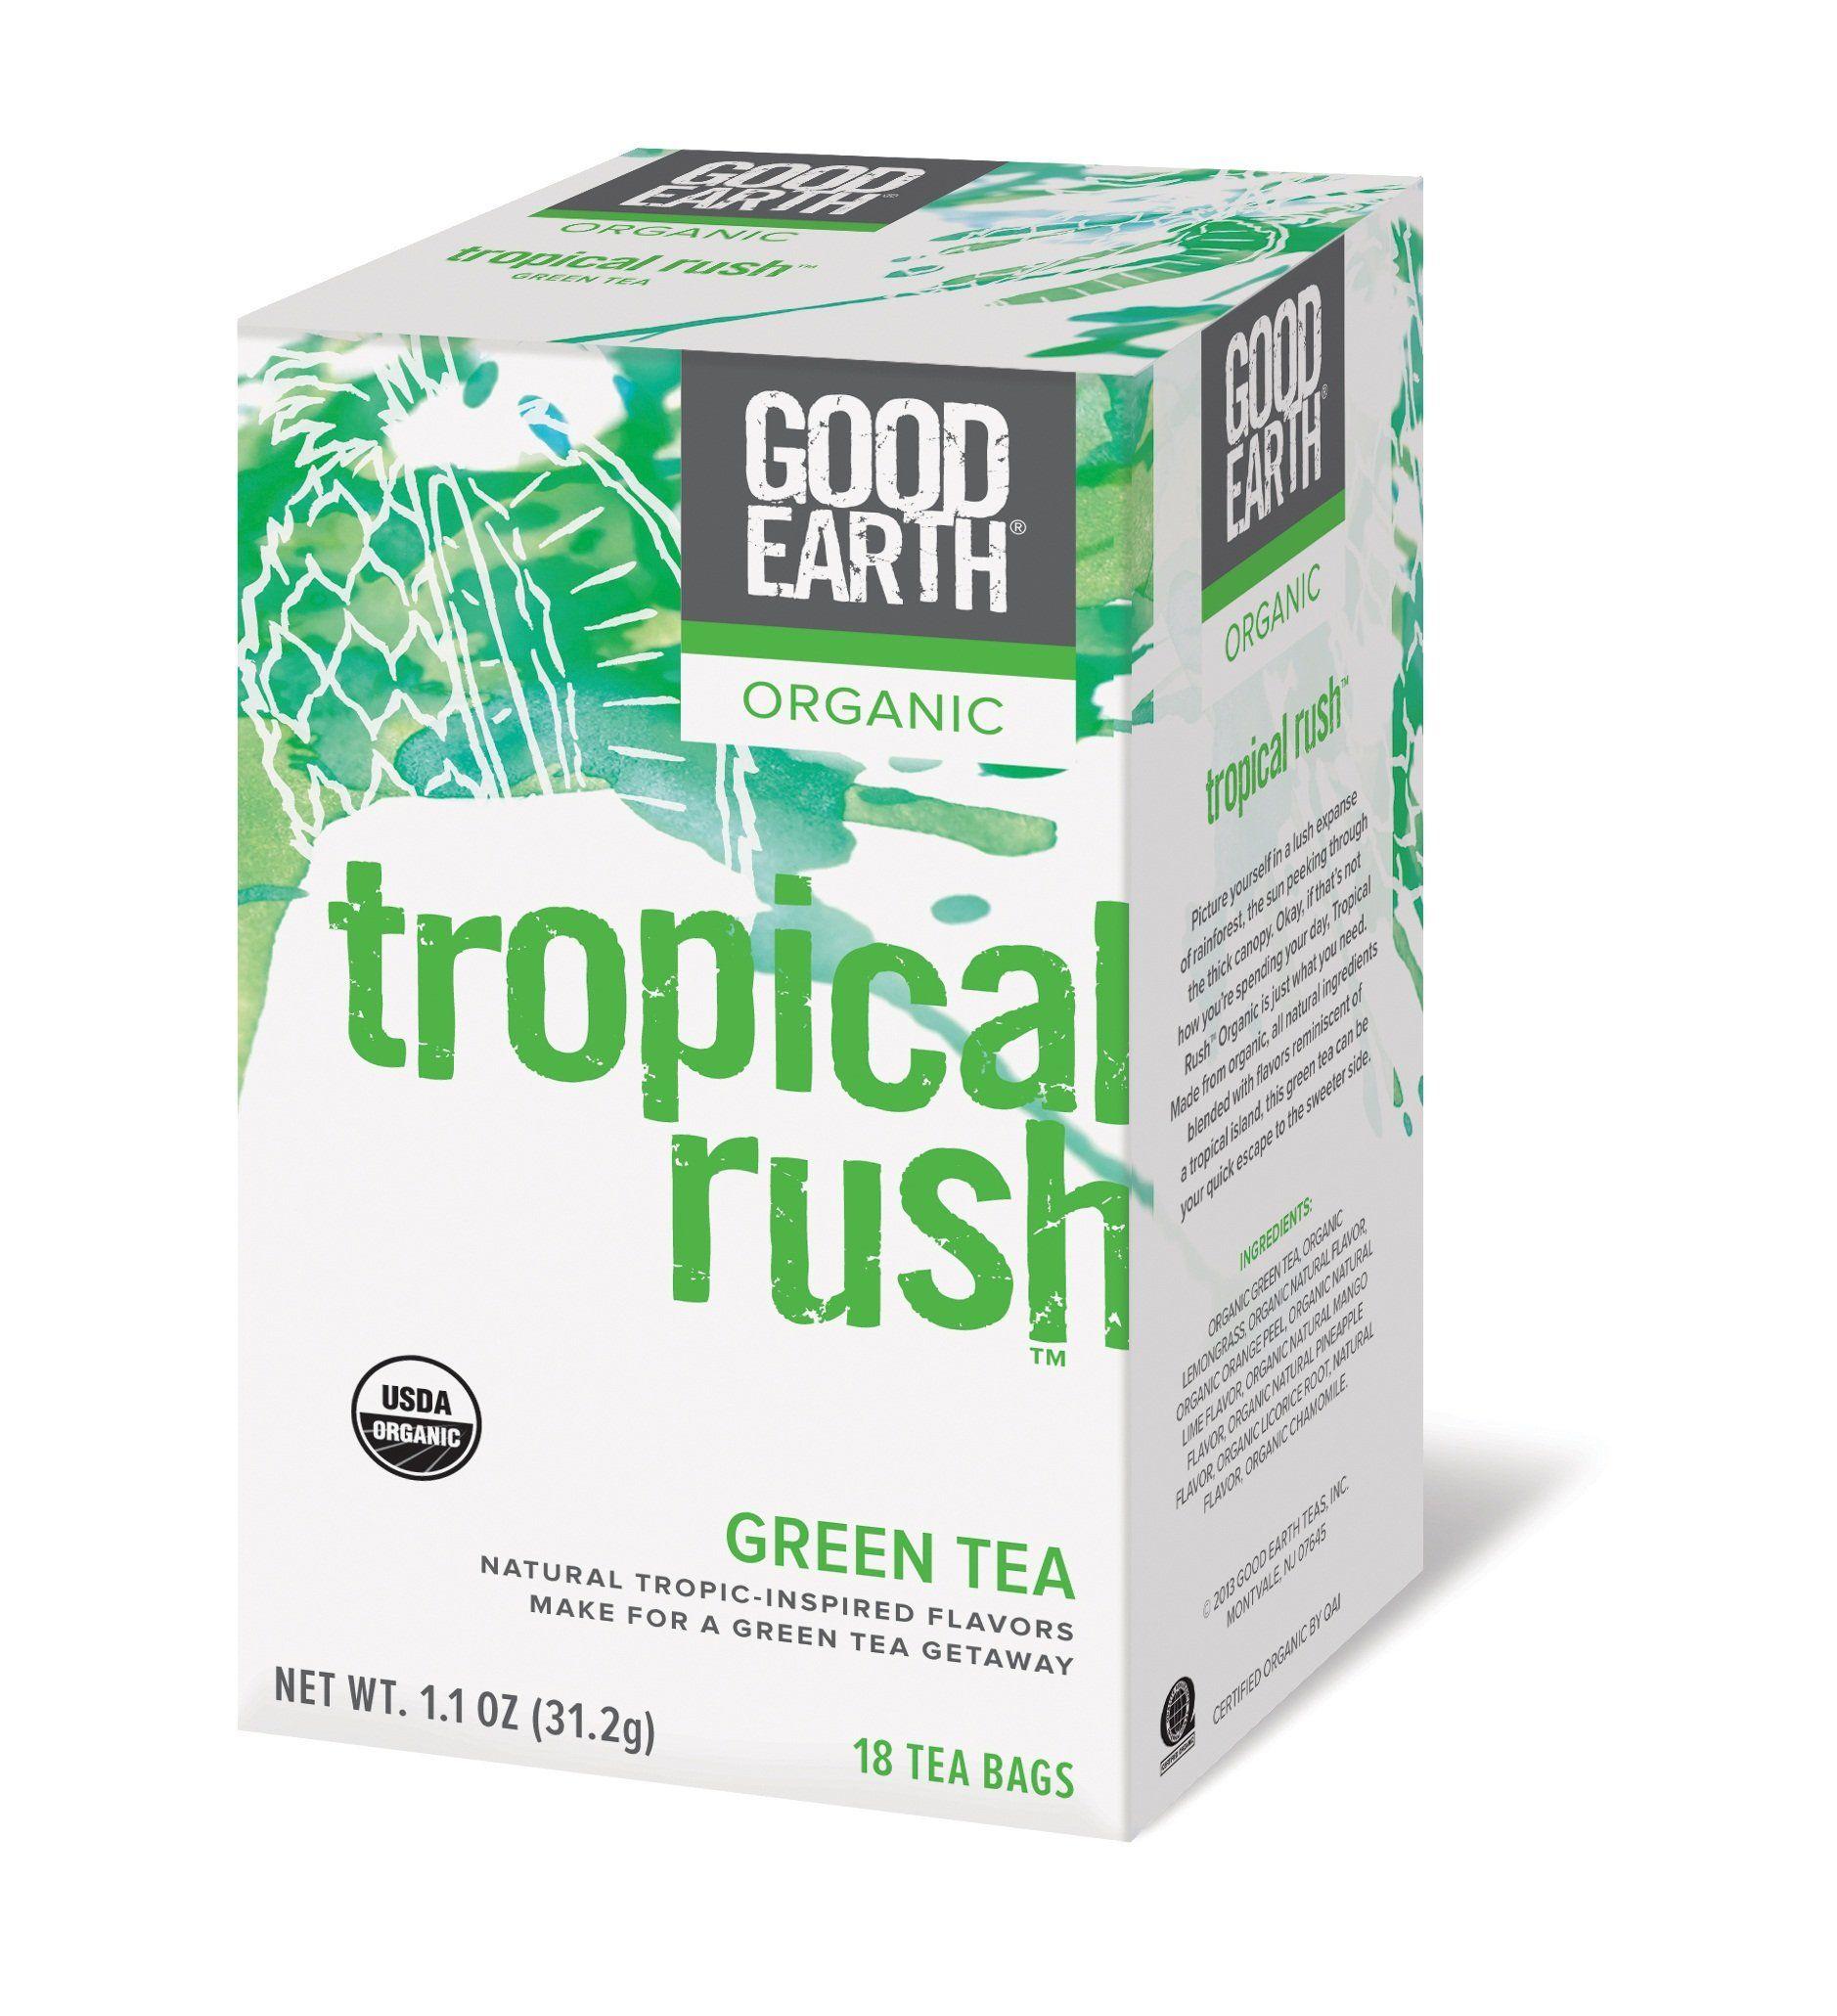 Good Earth Organic Tropical Rush Green Tea, 18 Count Tea Bags (Pack of 6)